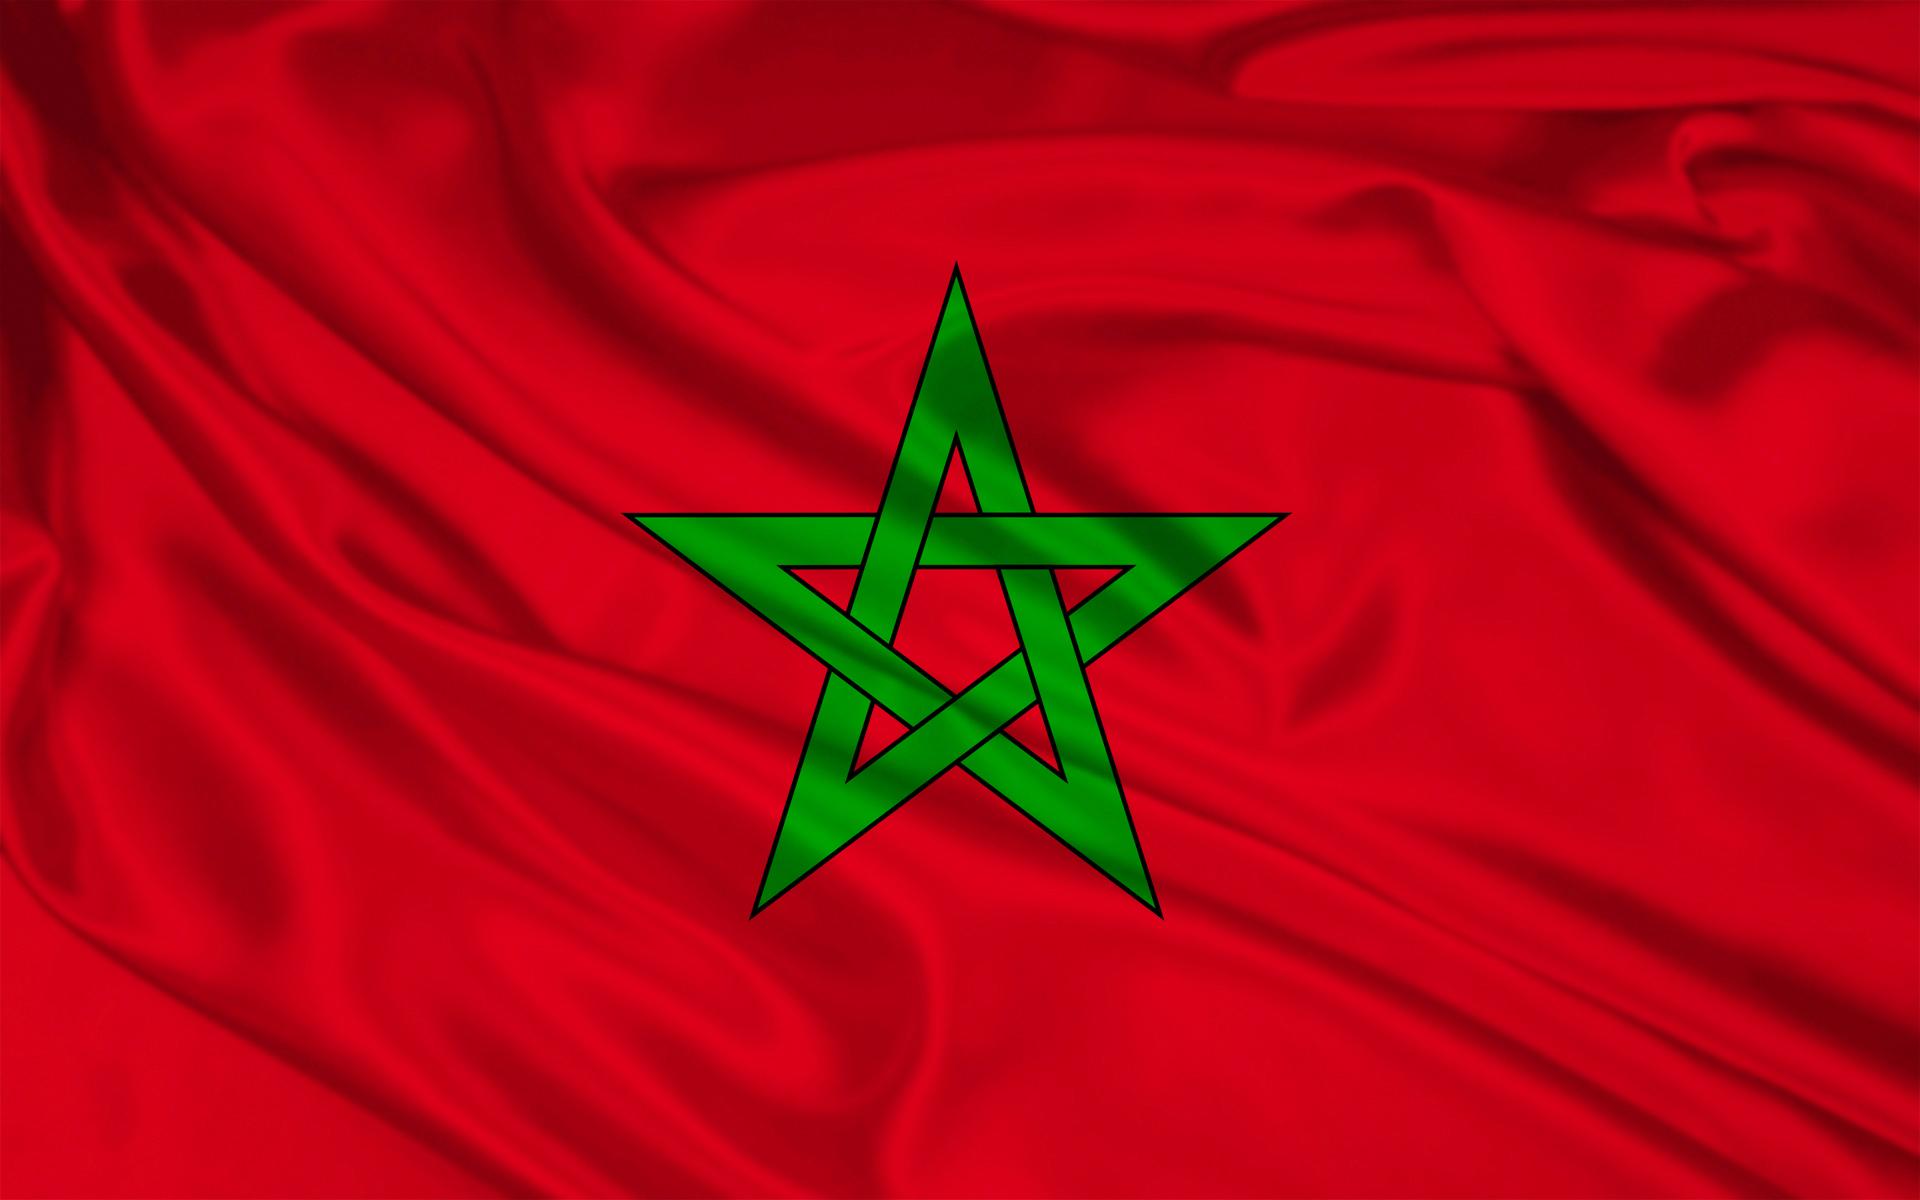 Morocco Flag wallpaper 1920x1200 32854 1920x1200